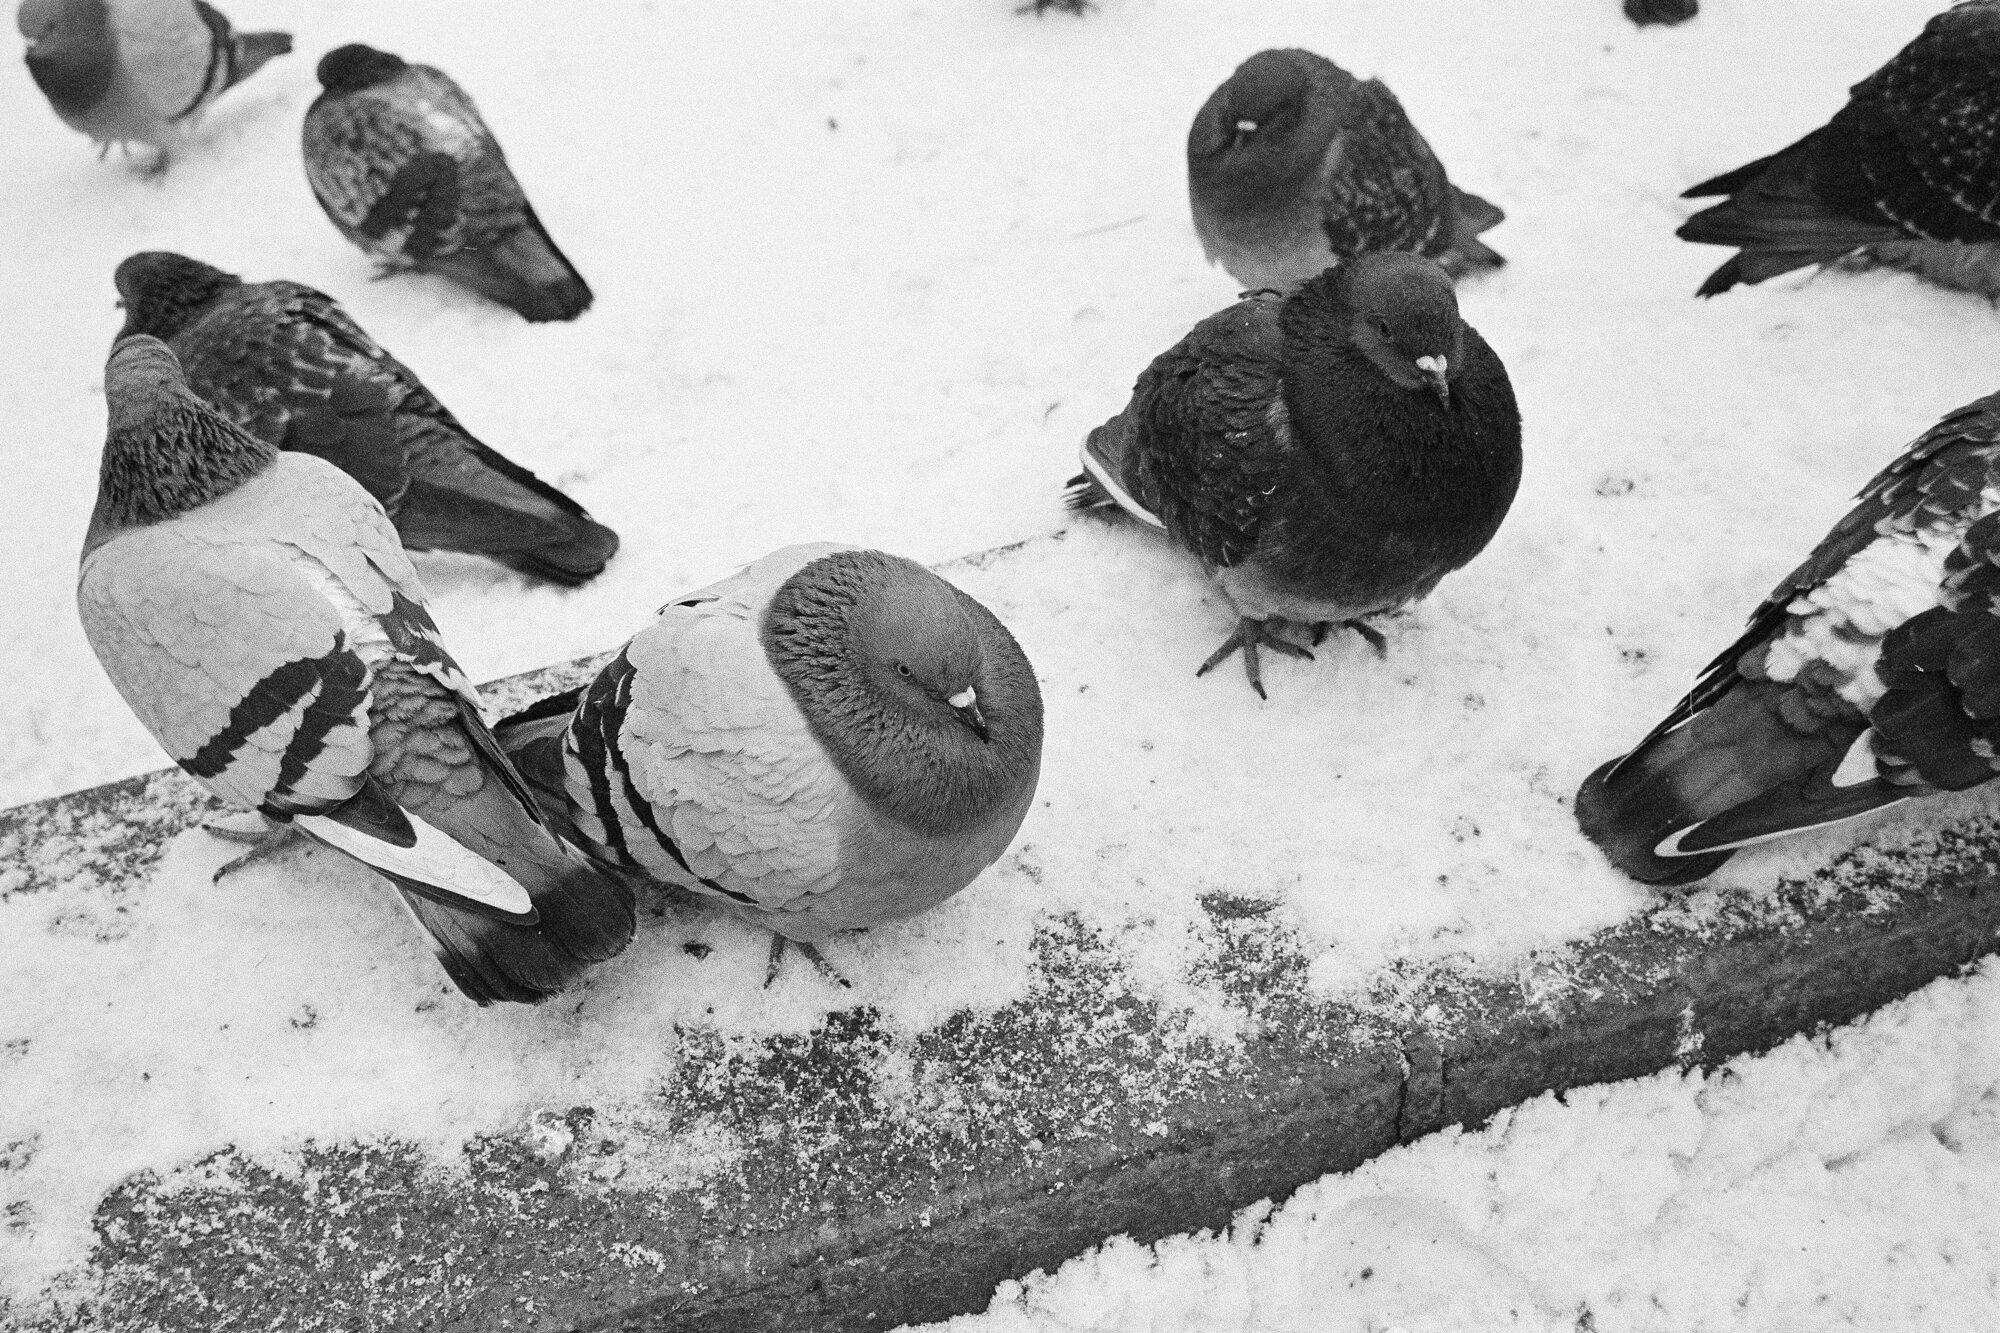 Ignas_Winter-3.jpg